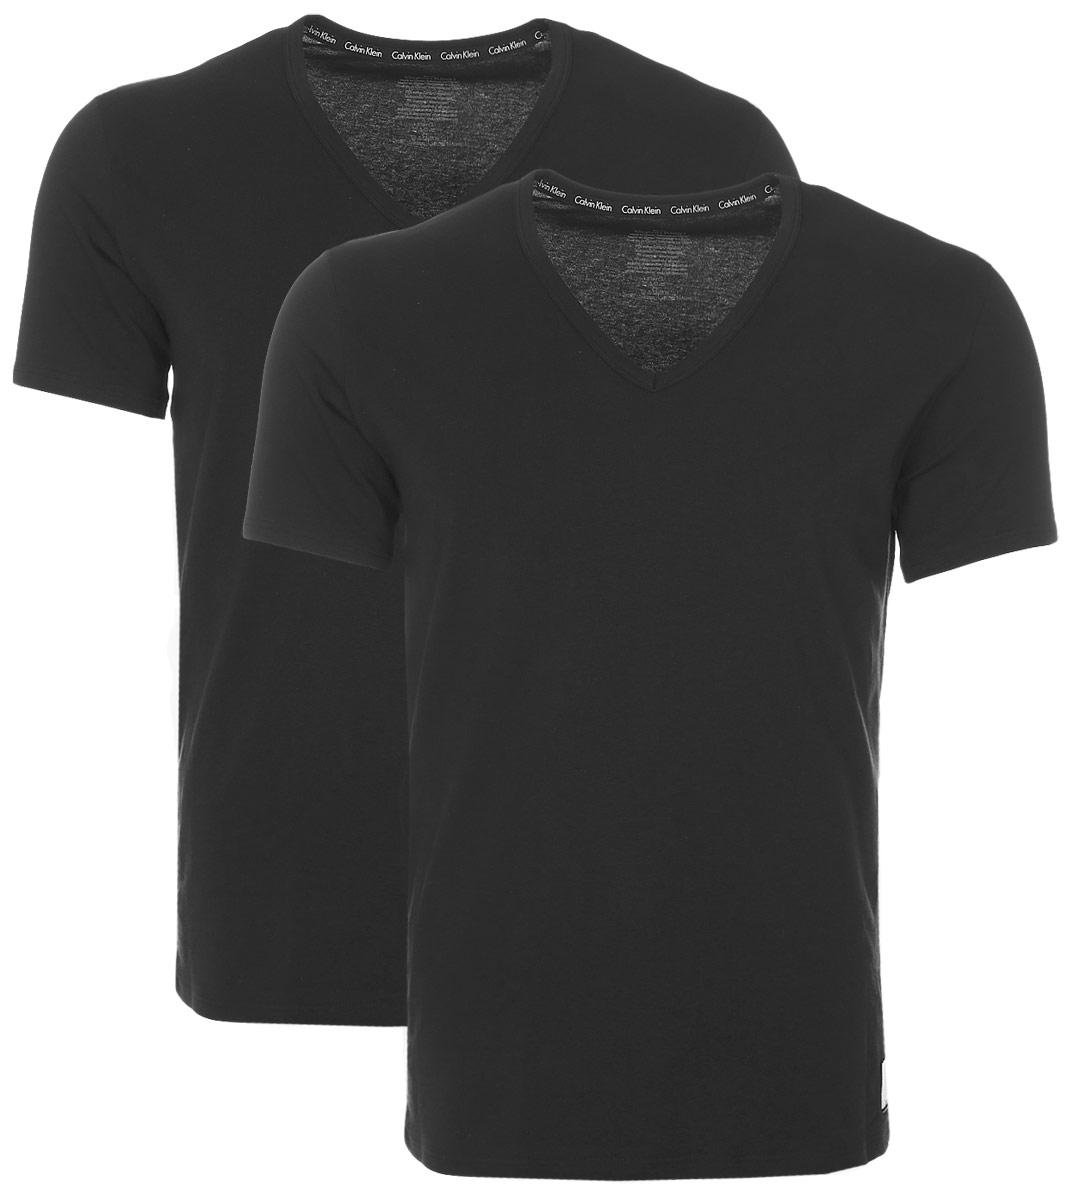 Футболка для дома мужская Calvin Klein Underwear, цвет: черный, 2 шт. NU8698A. Размер M (46/48) calvin klein underwear шорты